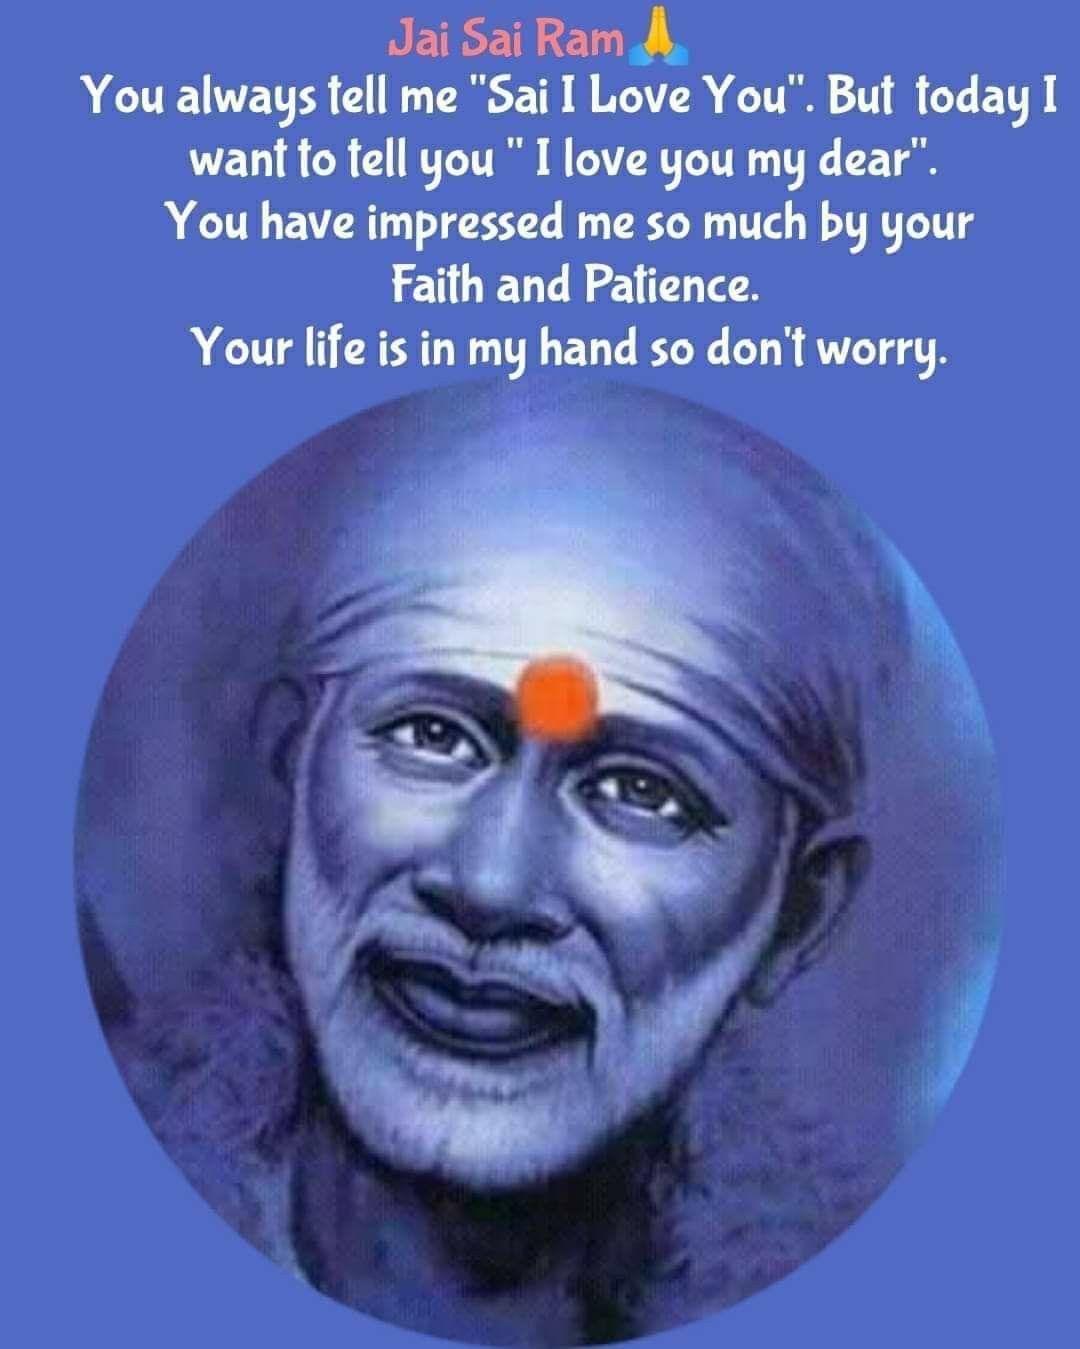 Pin By Sri Lakshmi On Sai Baba Quotes Sai Baba Quotes Sai Baba Miracles Sai Baba Wallpapers